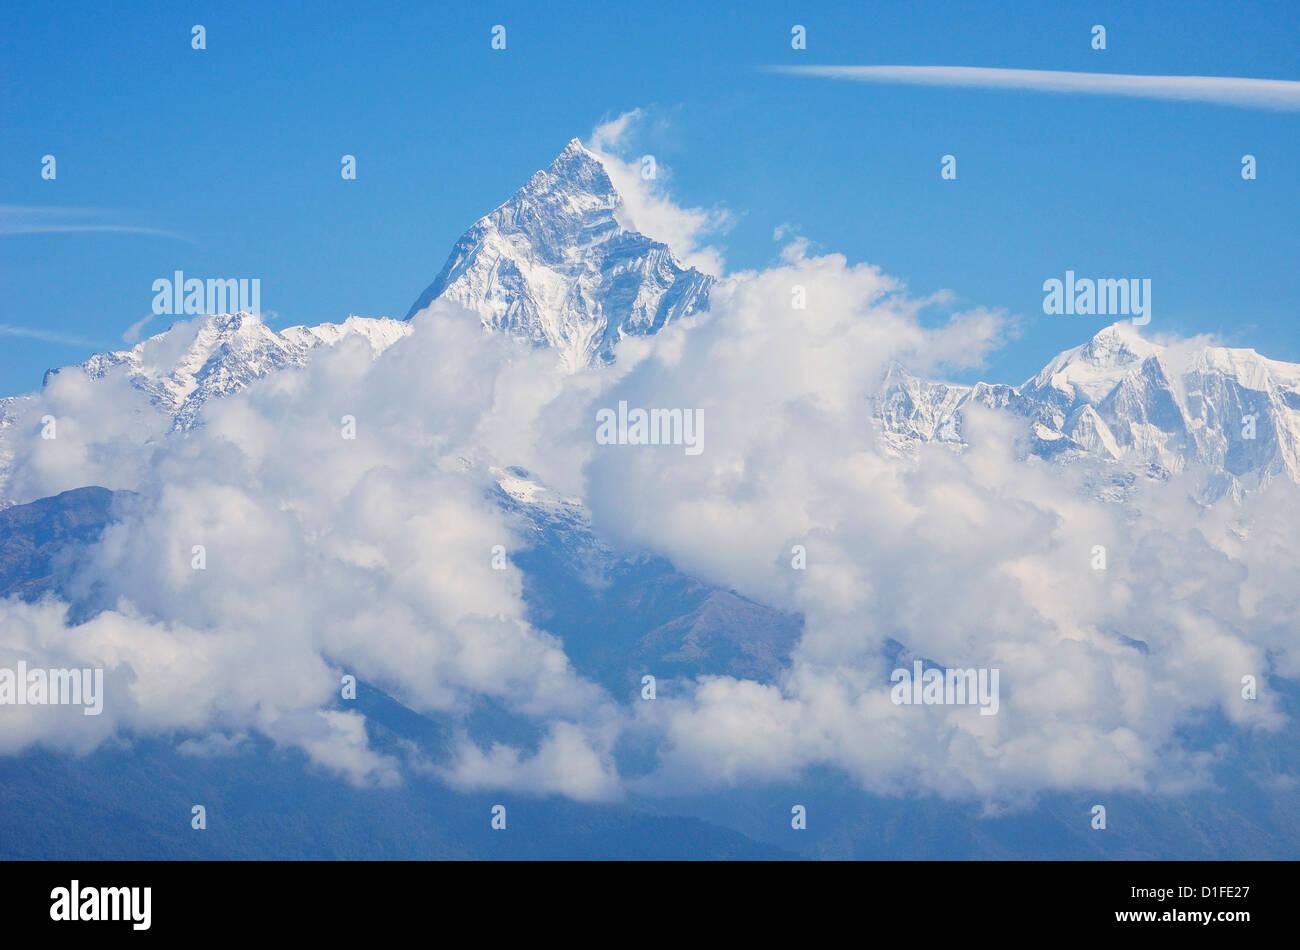 Visto desde Sarangkot Machapuchare, Gandaki zona, región occidental, Nepal, Himalaya, Asia Imagen De Stock